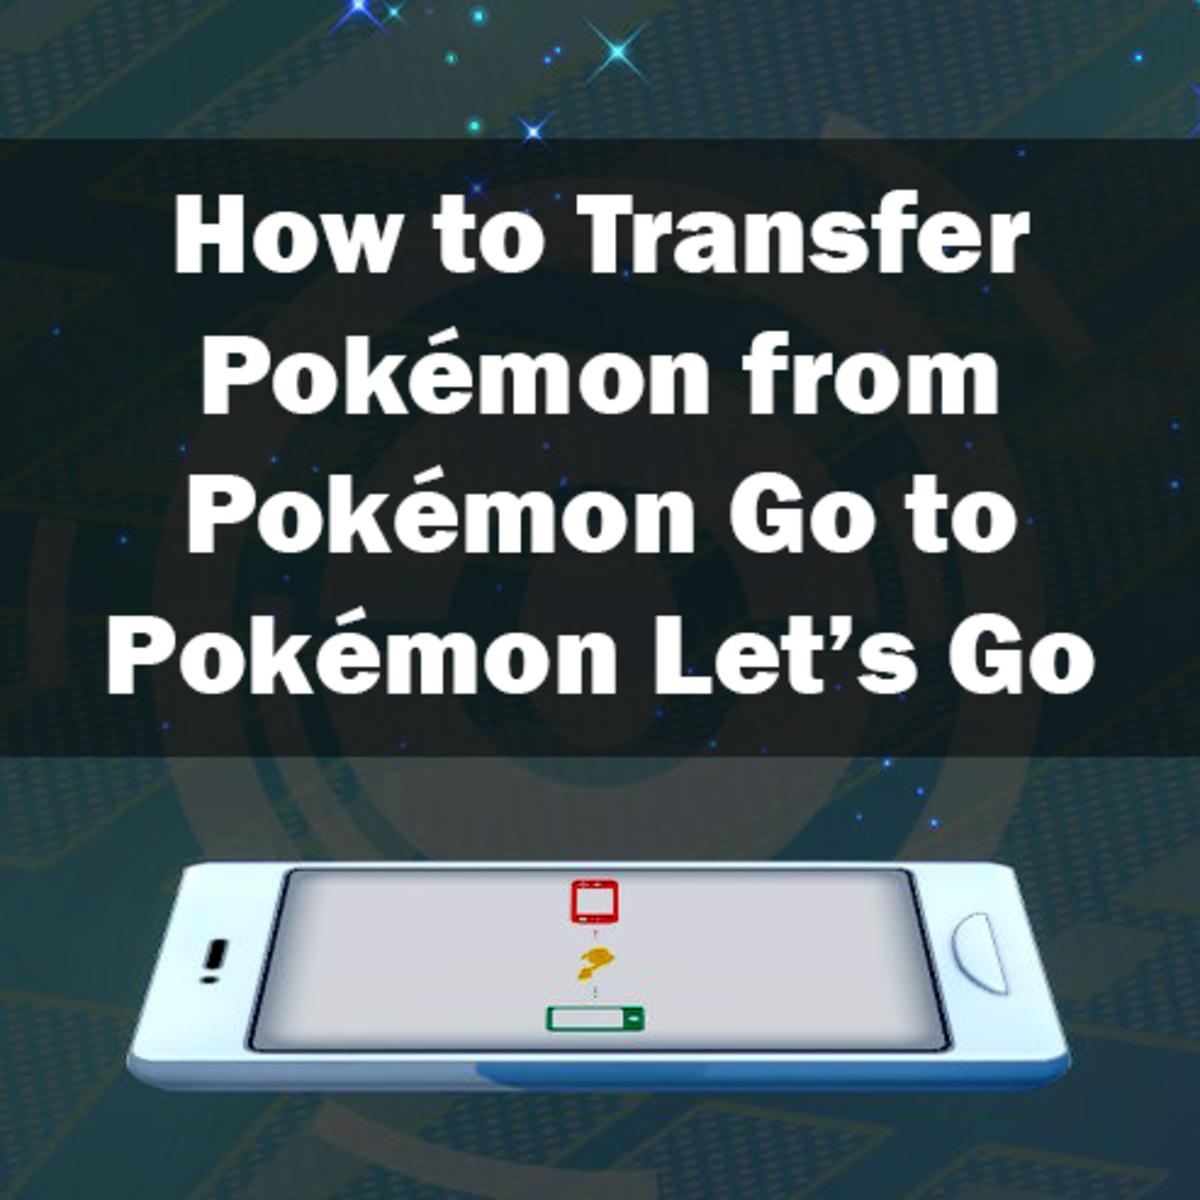 How to Transfer Pokémon From